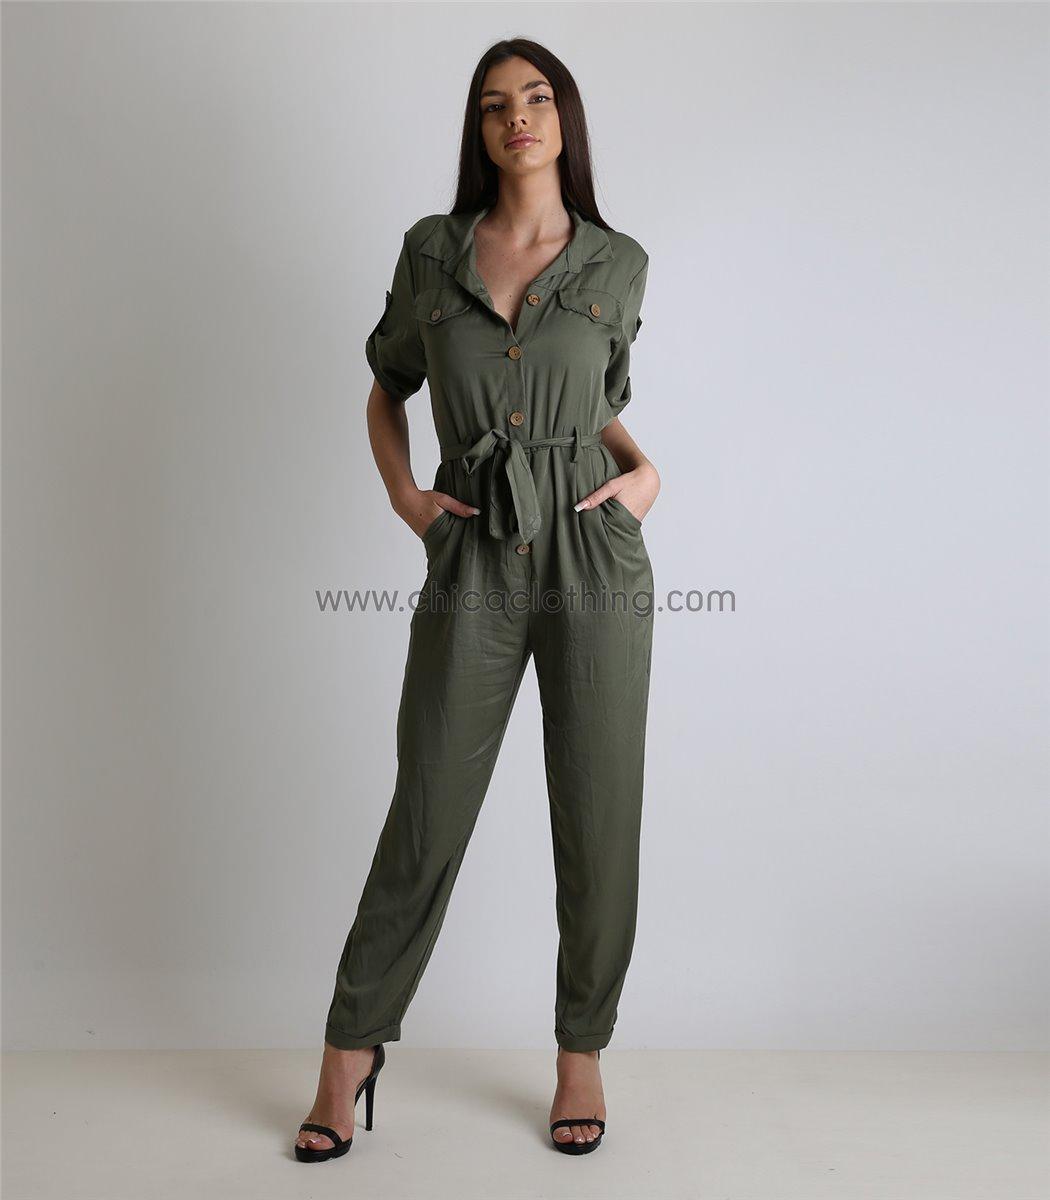 6a2eb9199c Γυναικεία ολόσωμη φόρμα με πατ μανικιών και κουμπιά (Χακί)